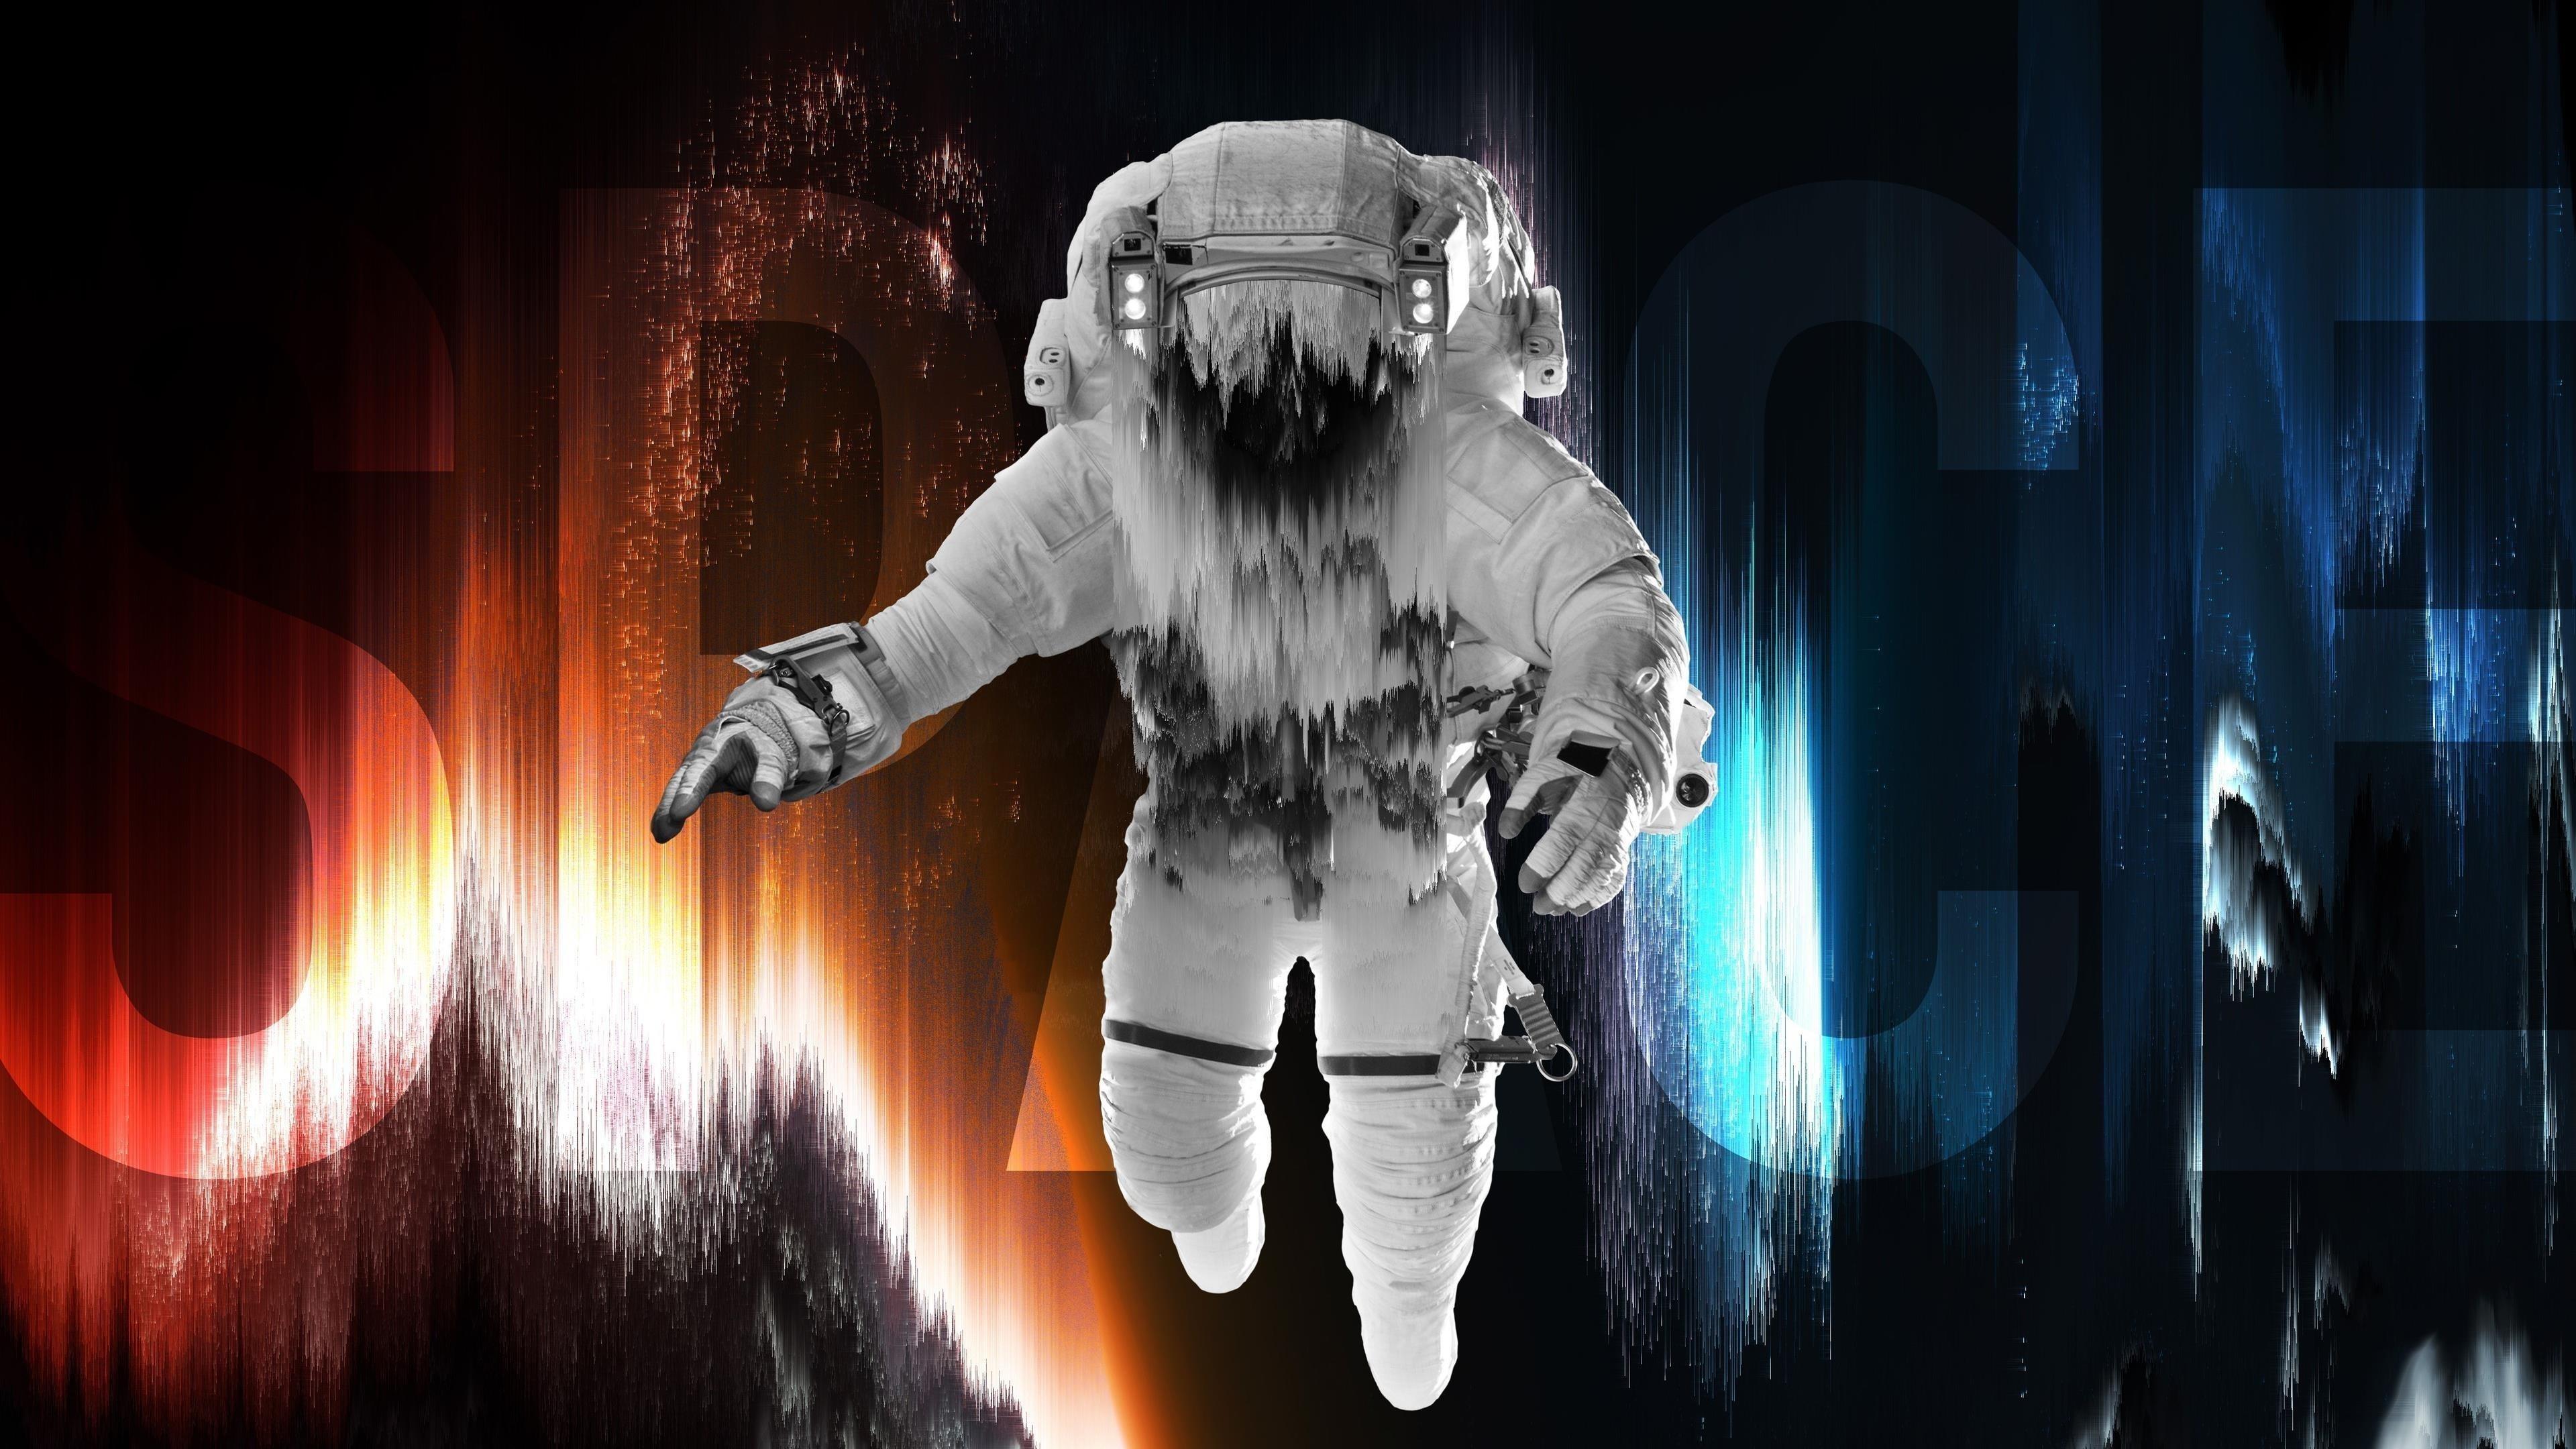 Astronaut in space обои скачать